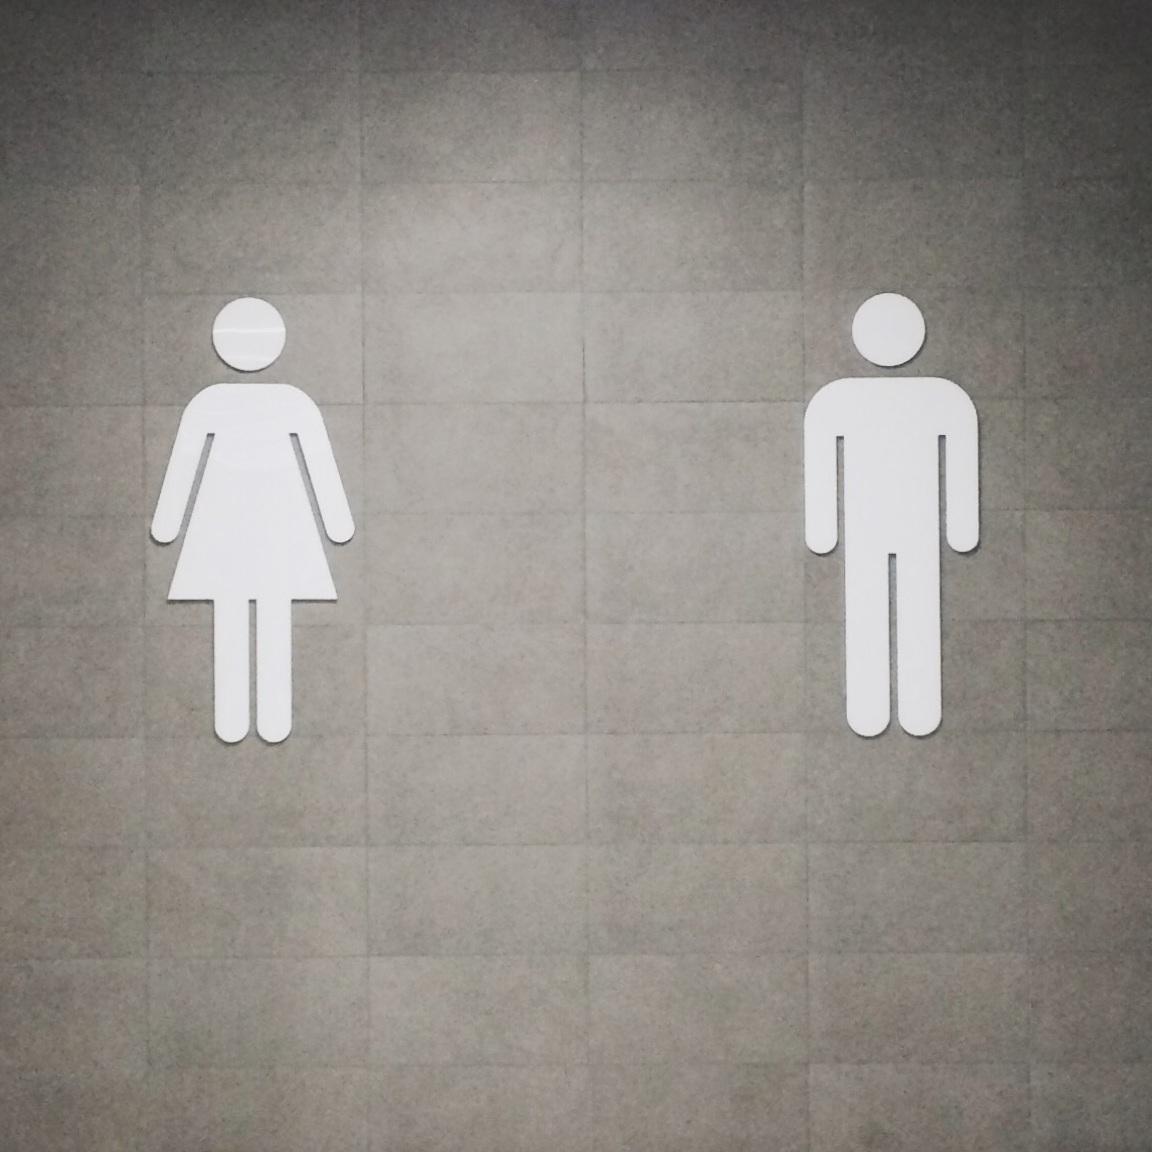 Woman and Man @jcmarin unsplash